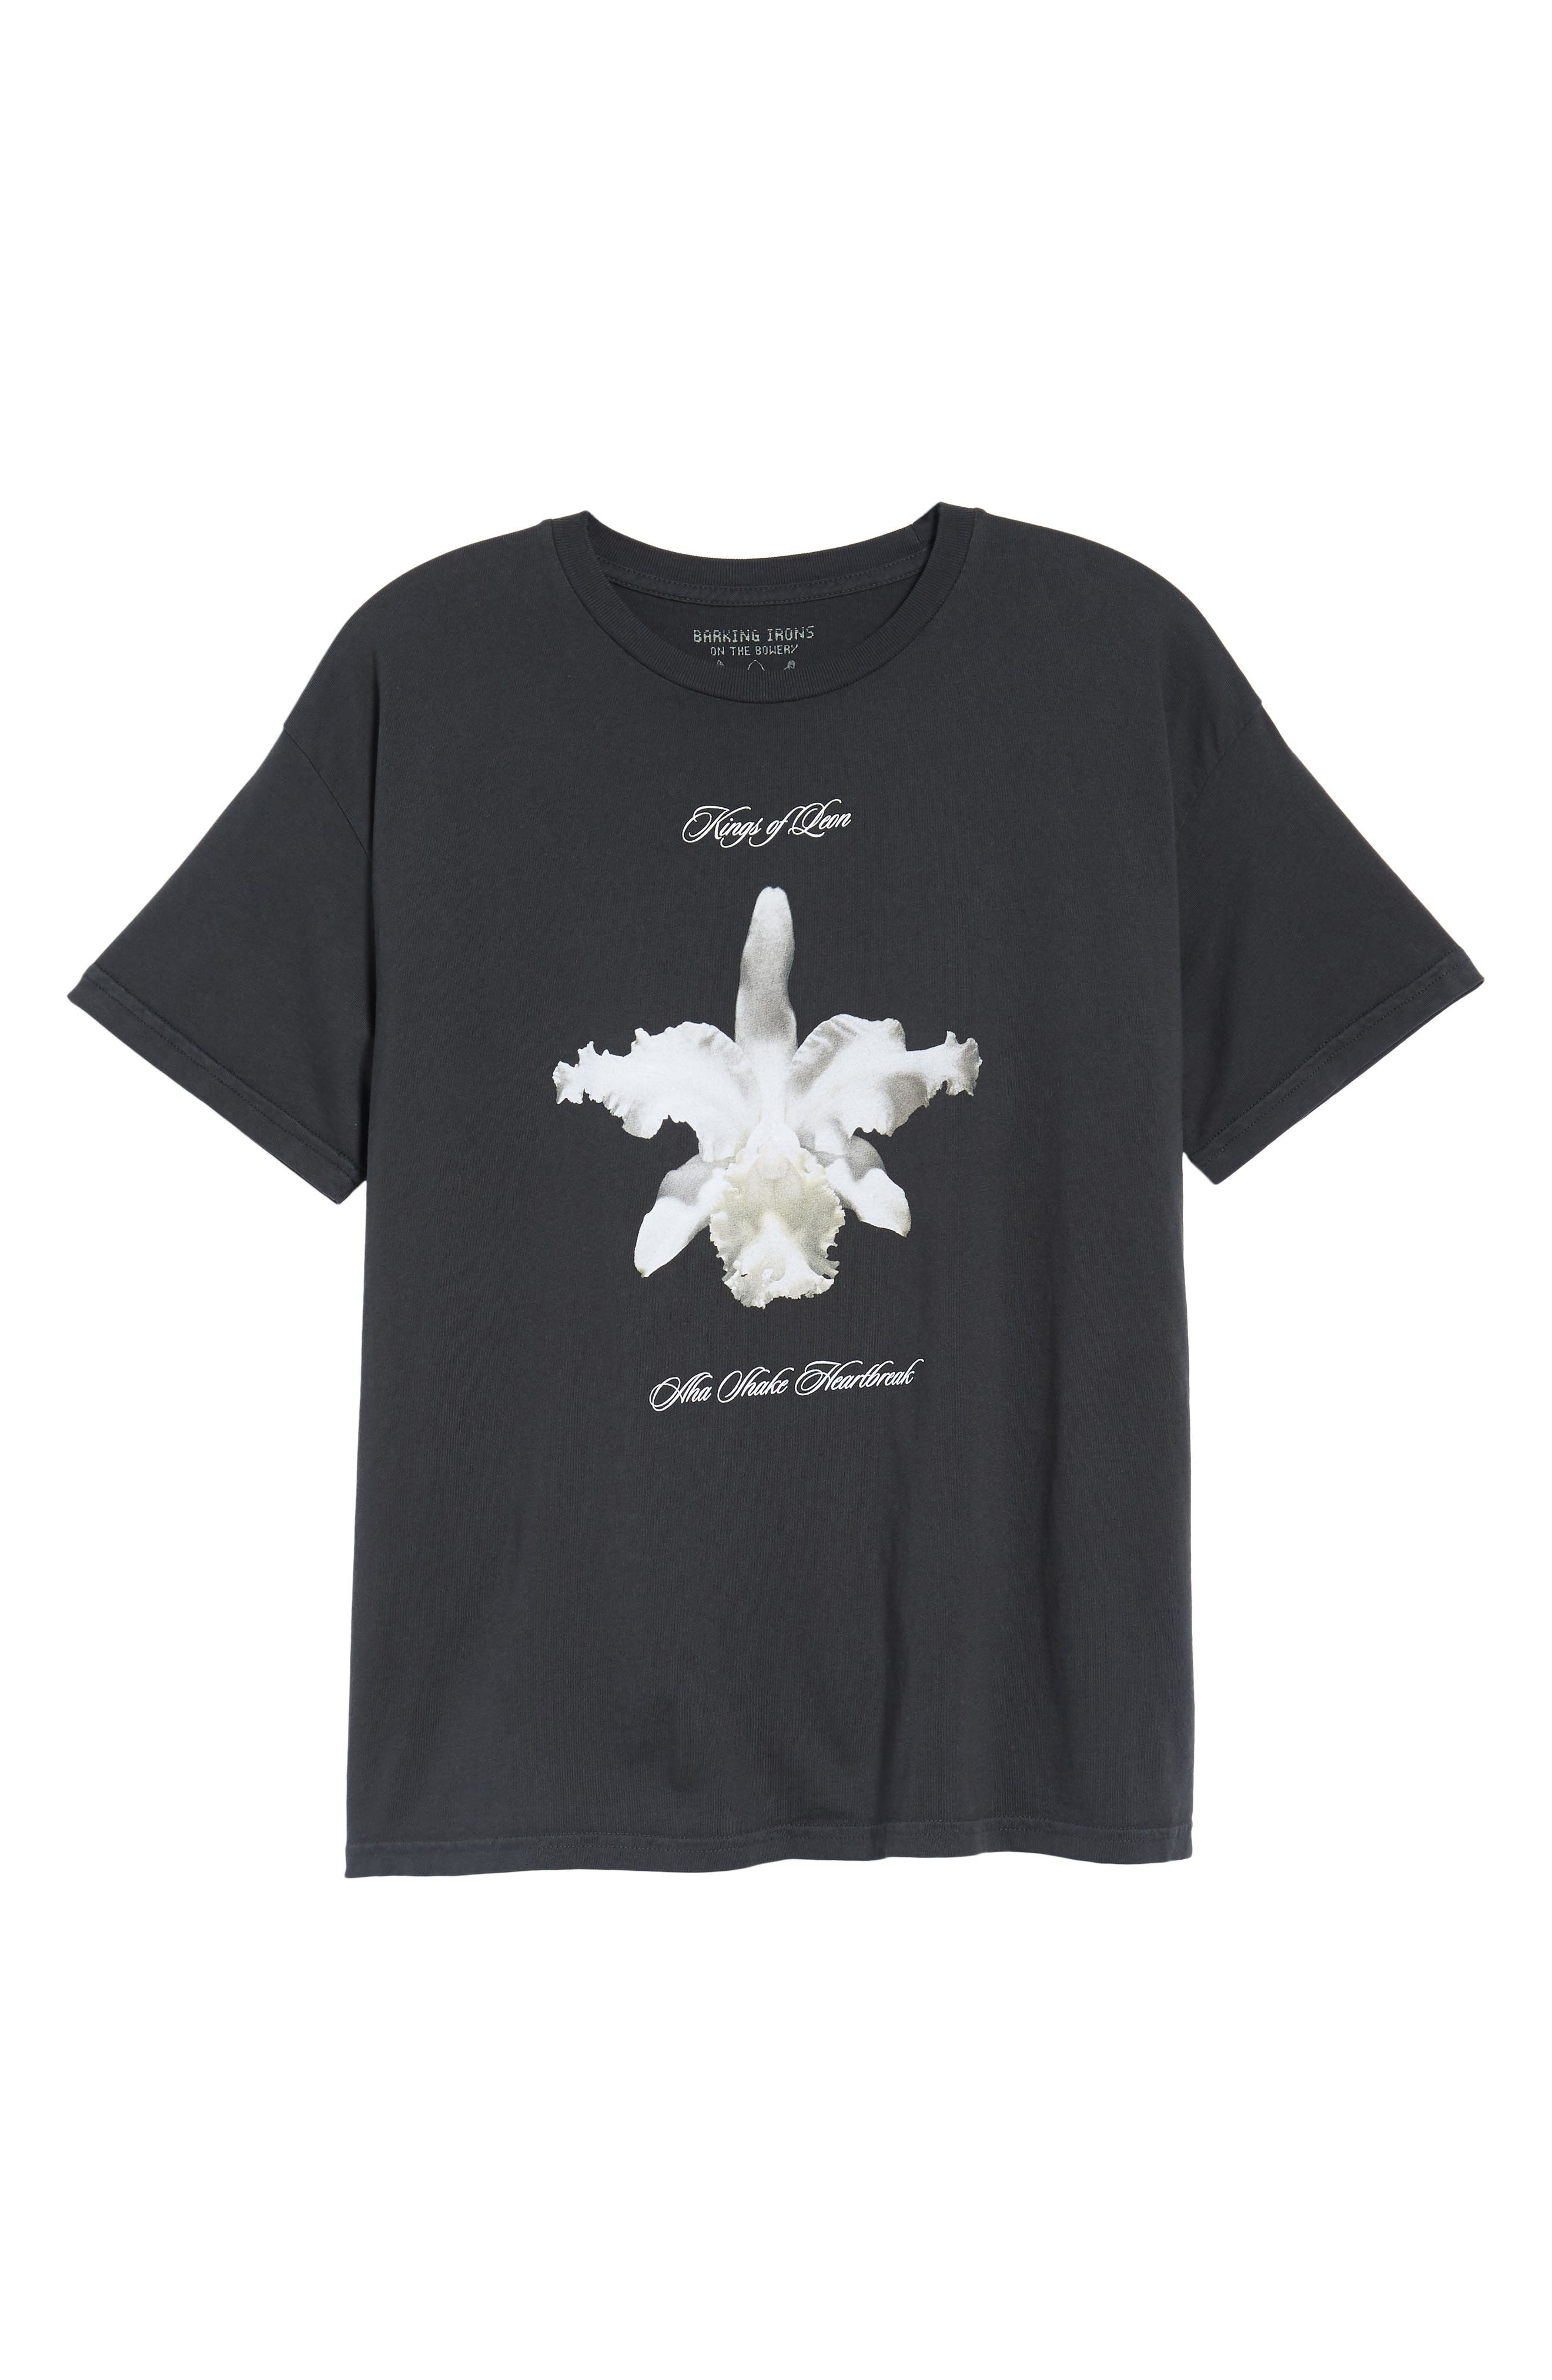 Kings of Leon Aha Shake Heartbreak T-Shirt,                             Alternate thumbnail 6, color,                             Dusty Black